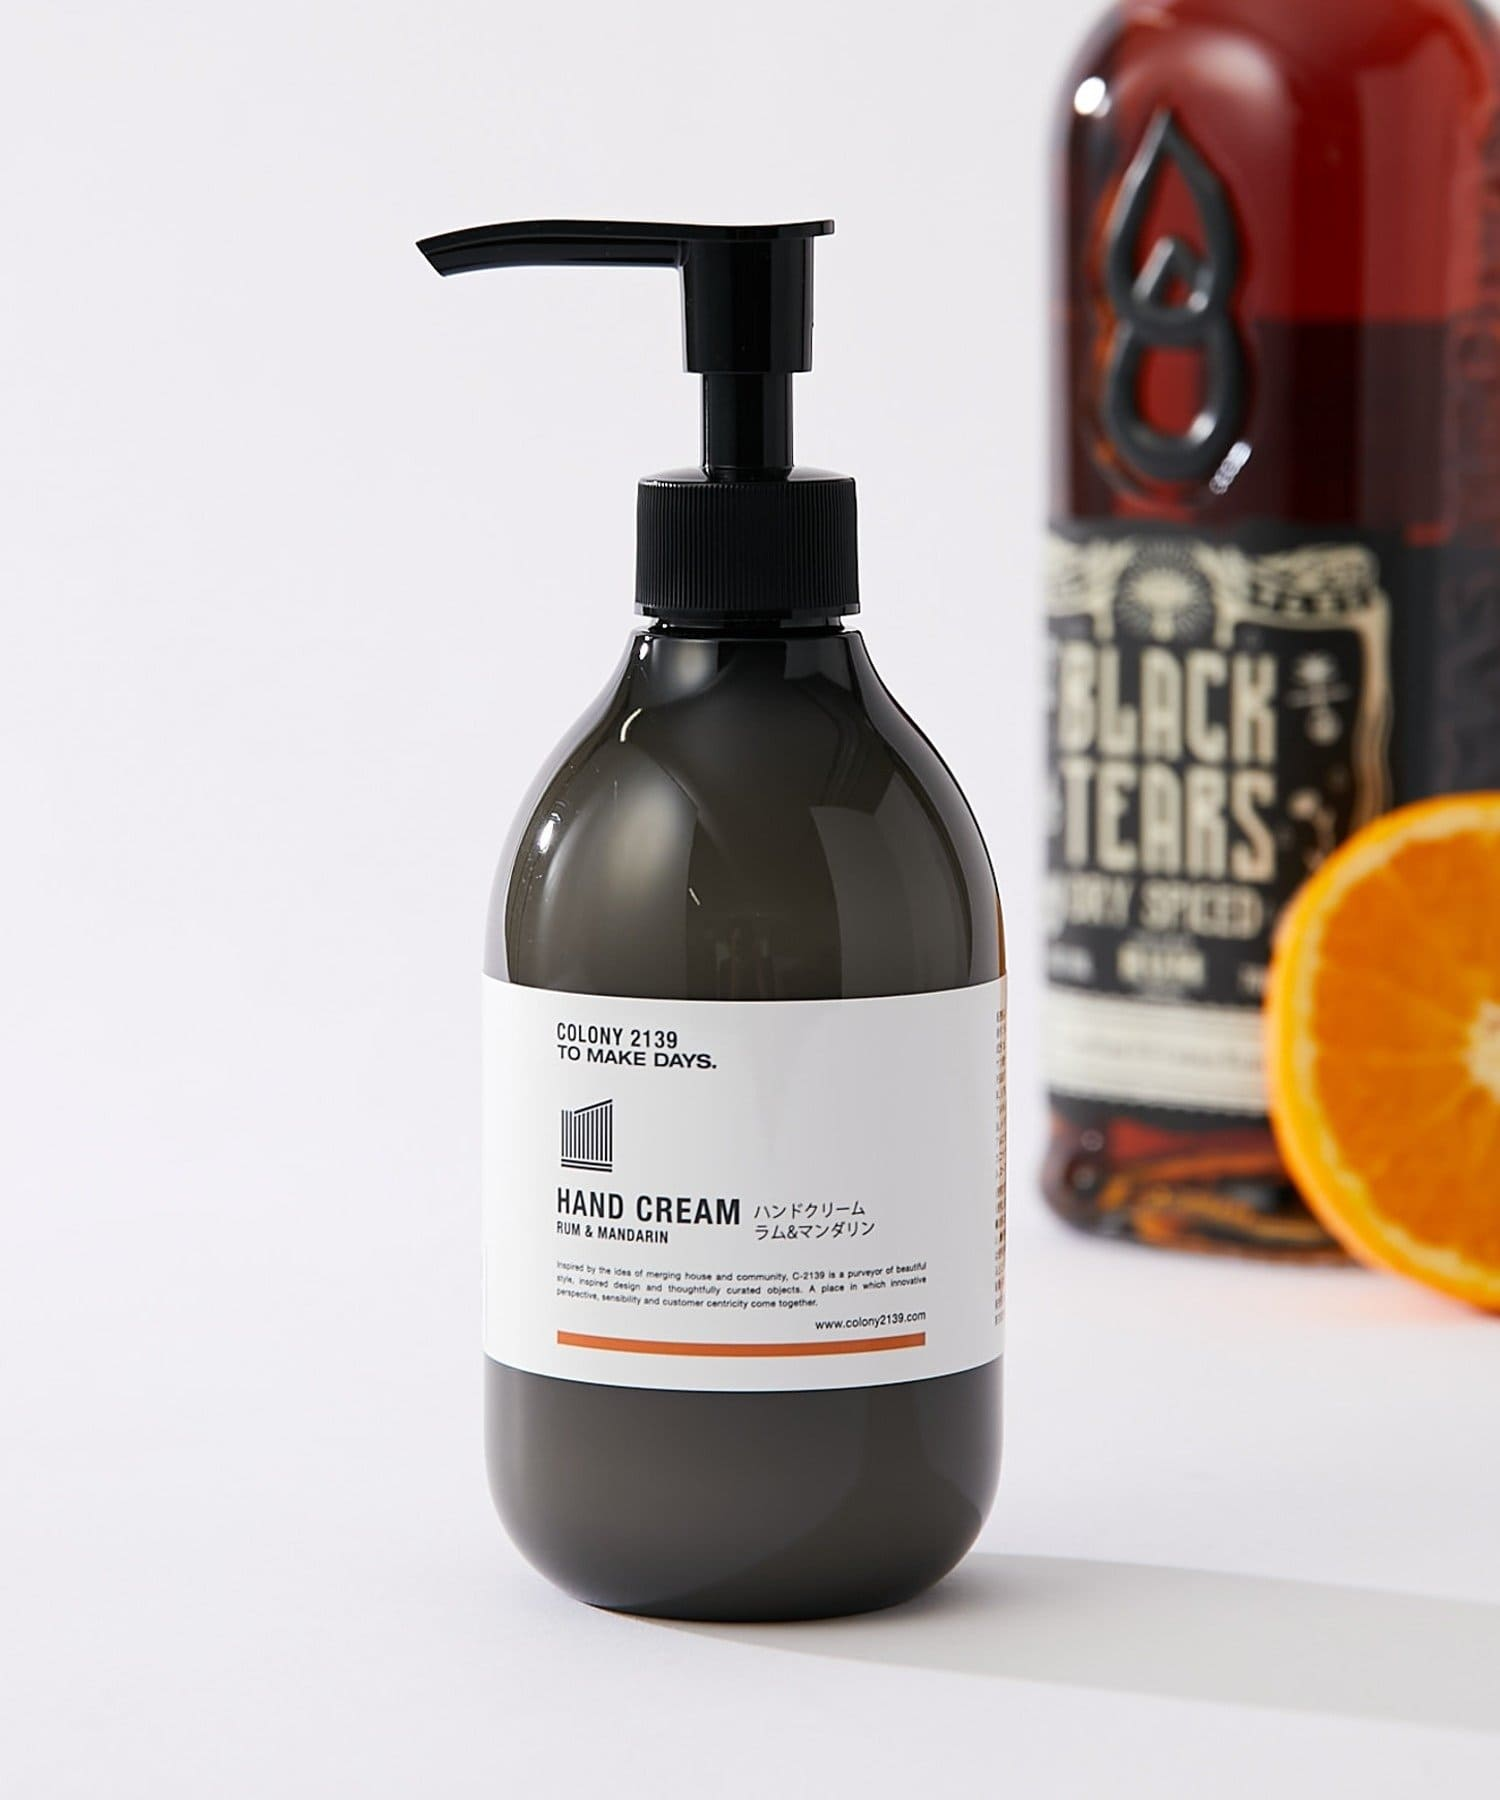 COLONY 2139(コロニー トゥーワンスリーナイン) ライフスタイル ハンドクリーム オレンジ